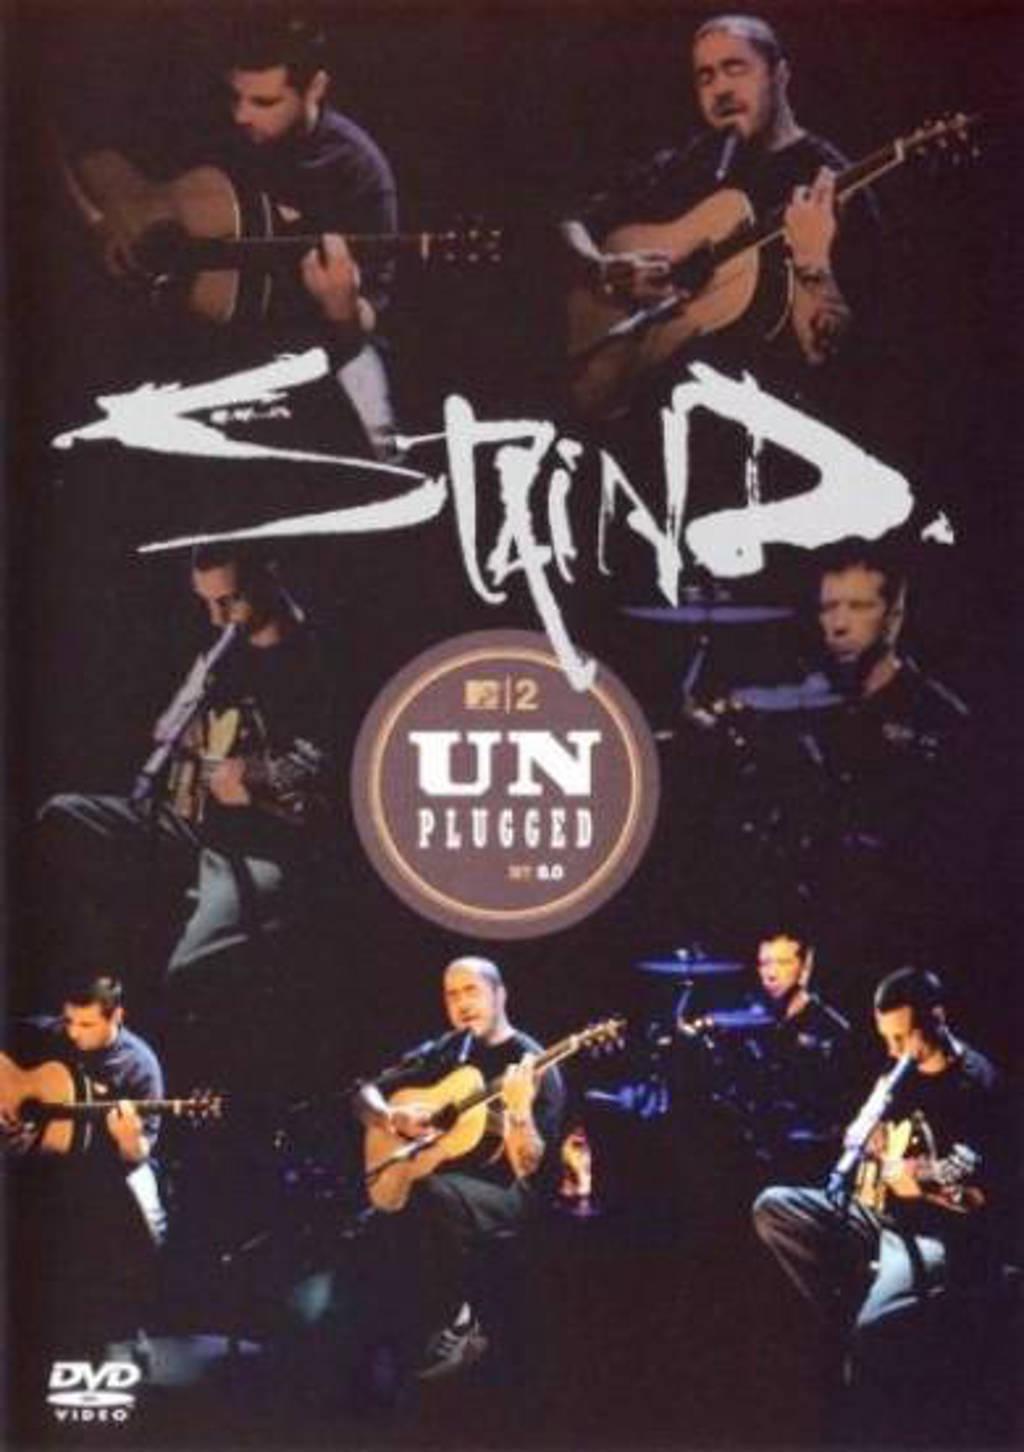 Staind - MTV Unplugged (DVD)